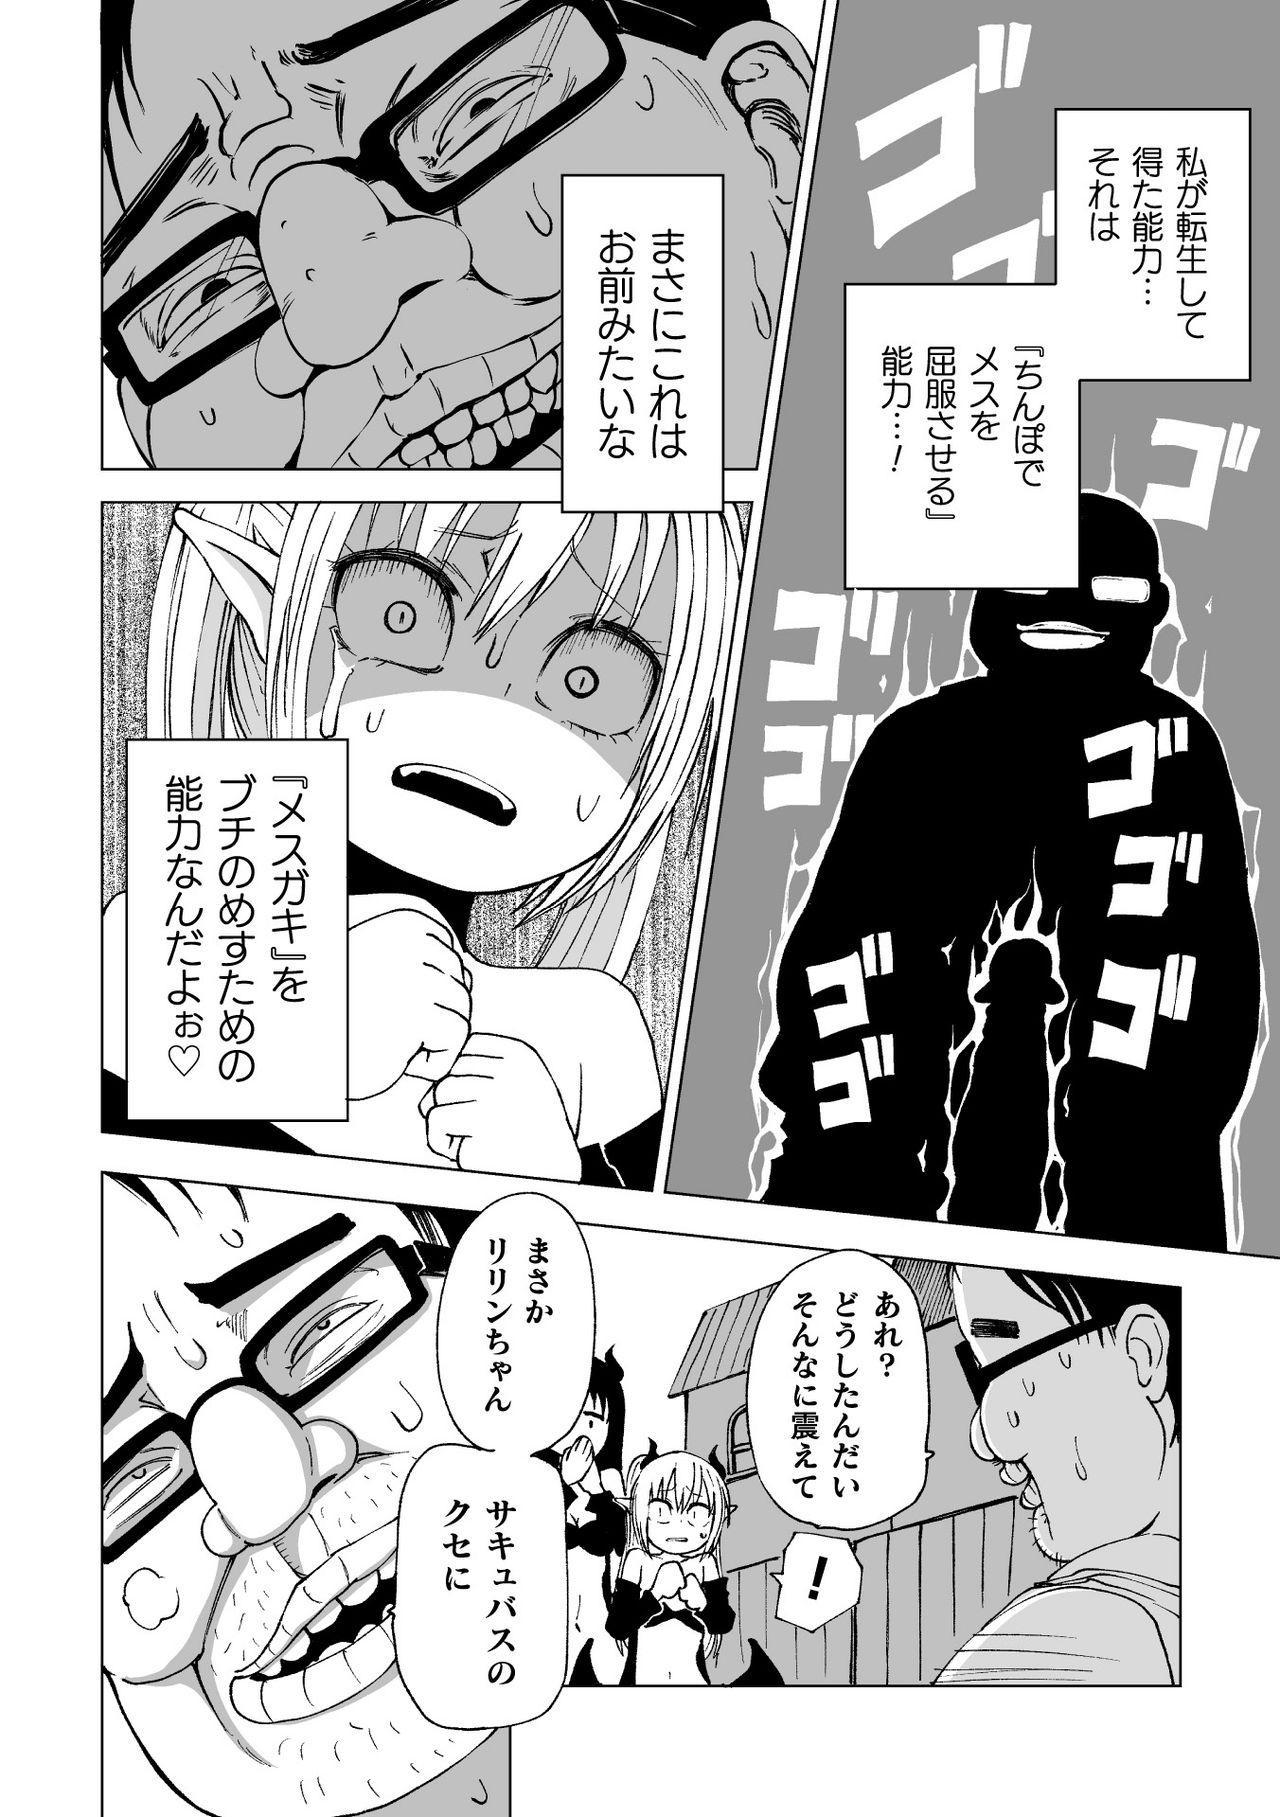 [Anthology] 2D Comic Magazine Mesugaki Succubus Seisai Namaiki Aka-chan Heya o Wakarase-bou de Kousei Knock Vol. 2 [Digital] 63